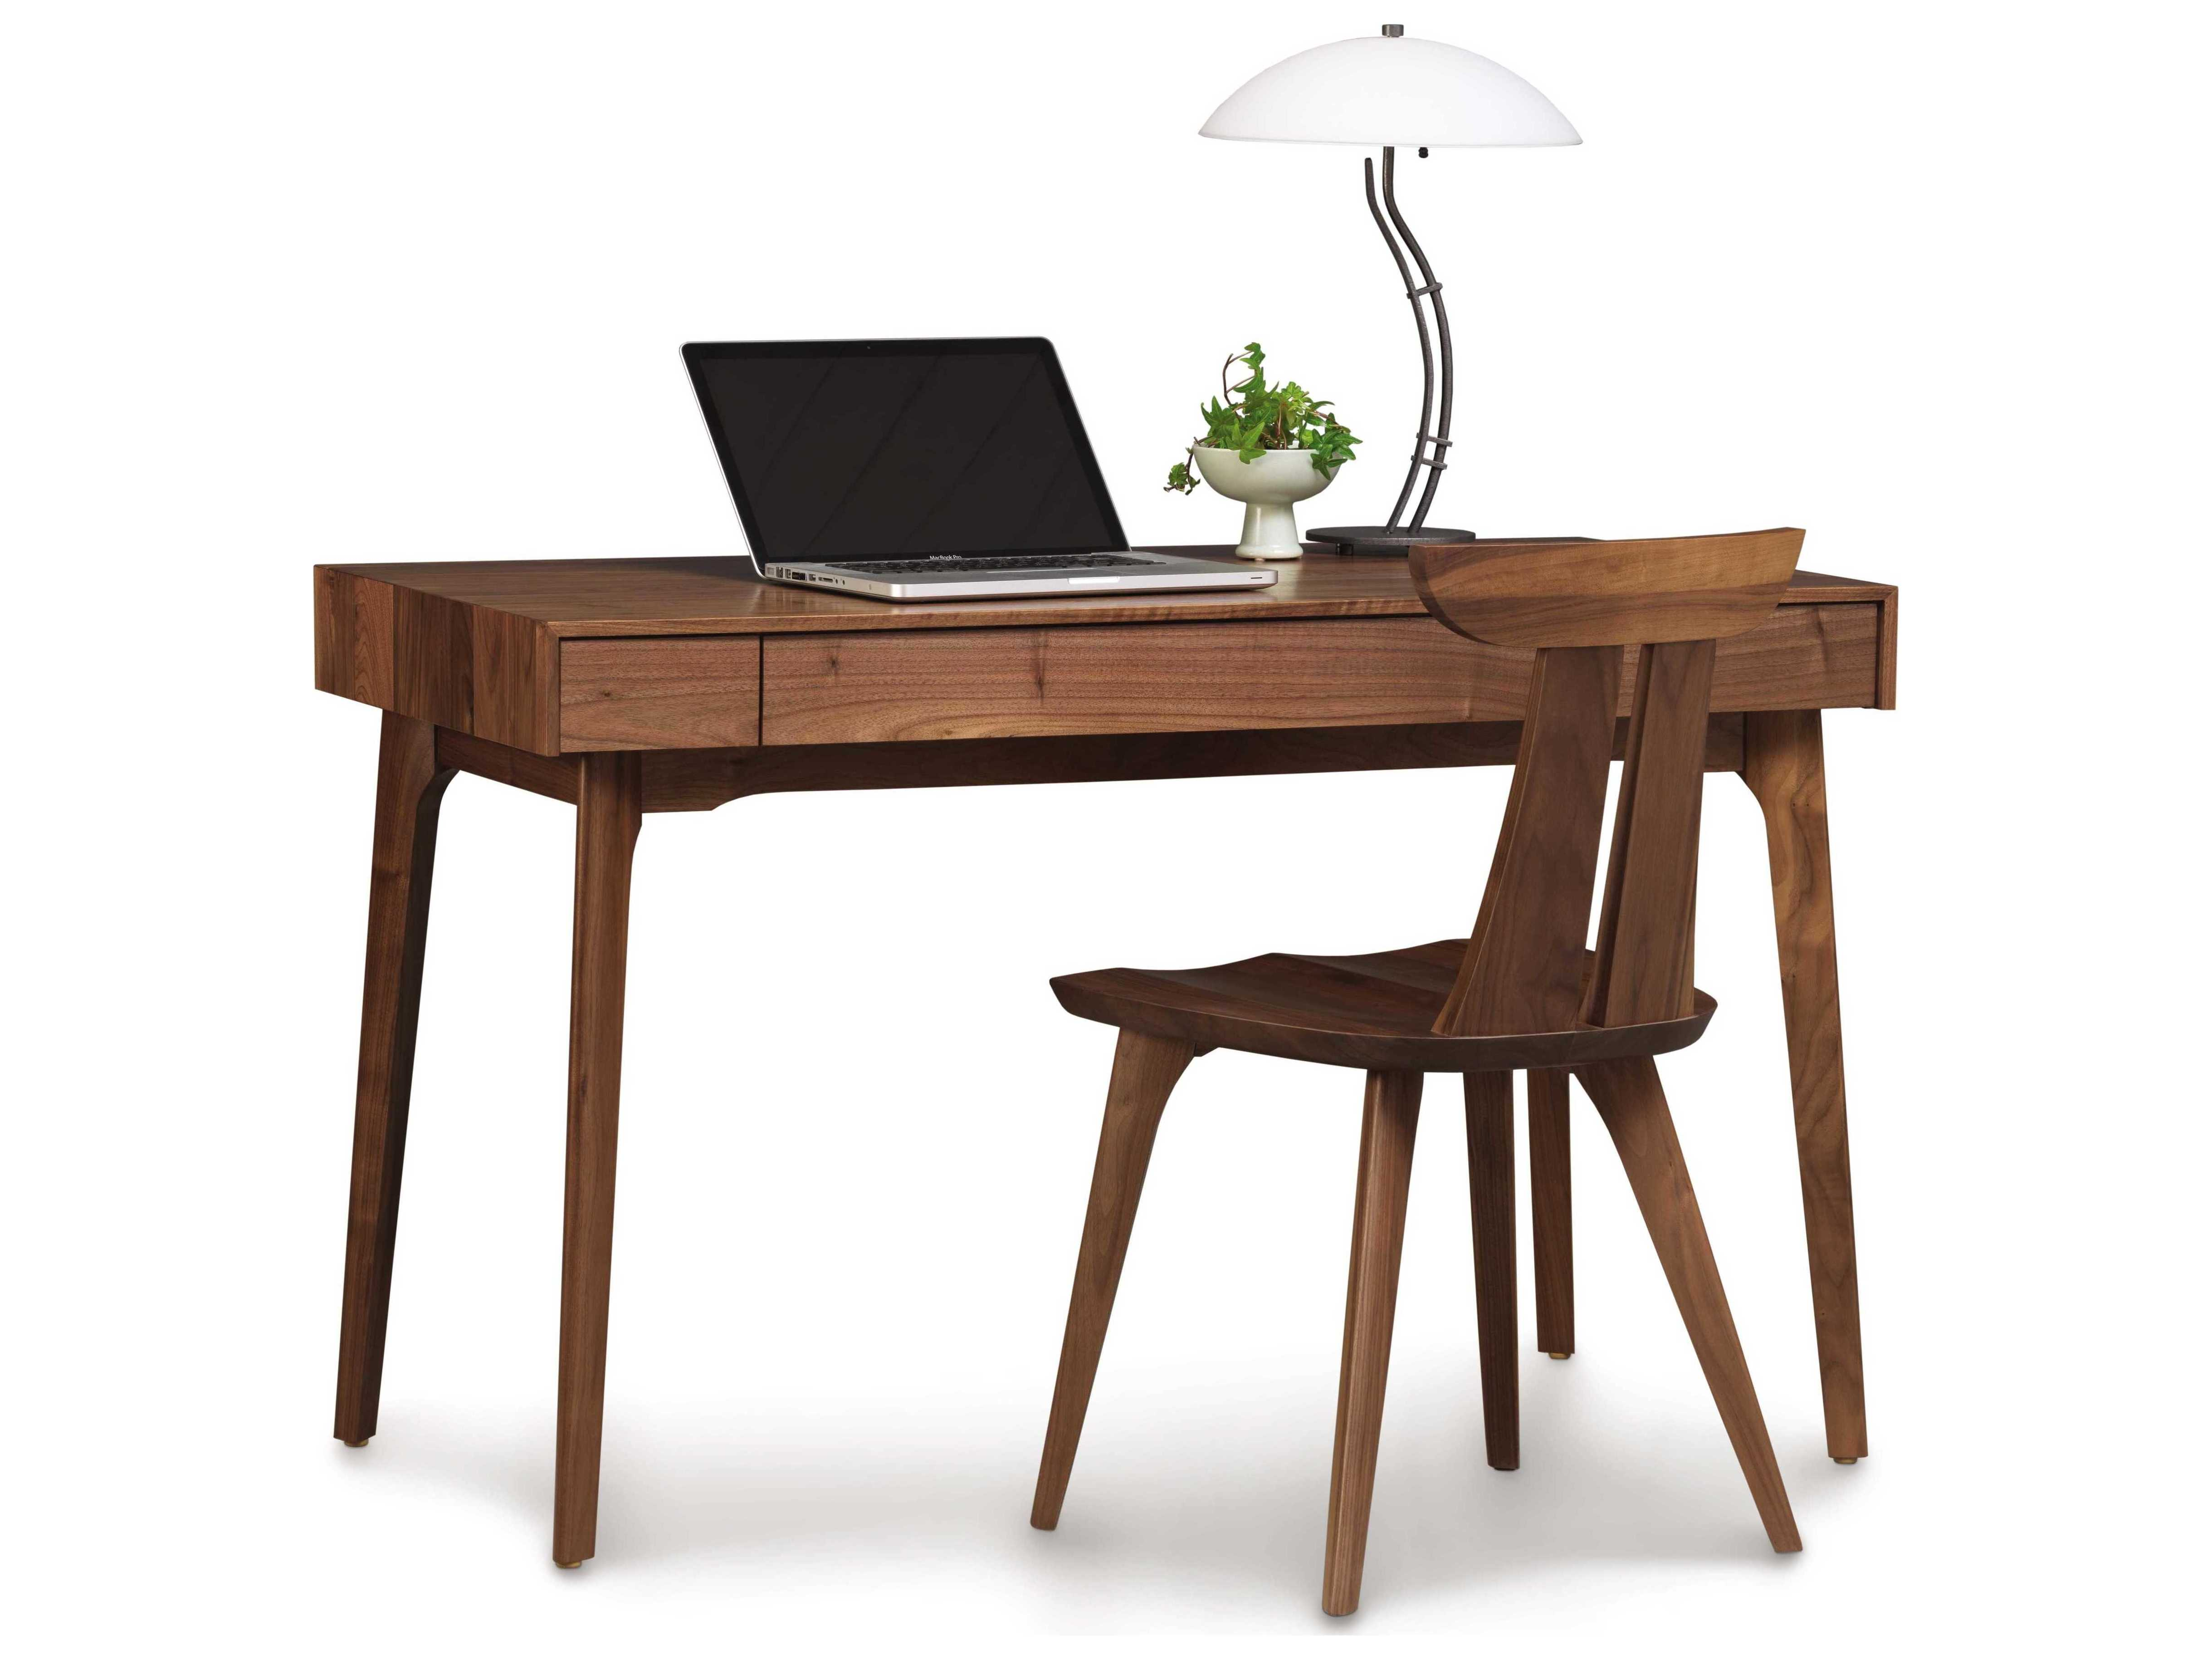 Copeland Furniture Catalina Natural Walnut 48 L X 24 W